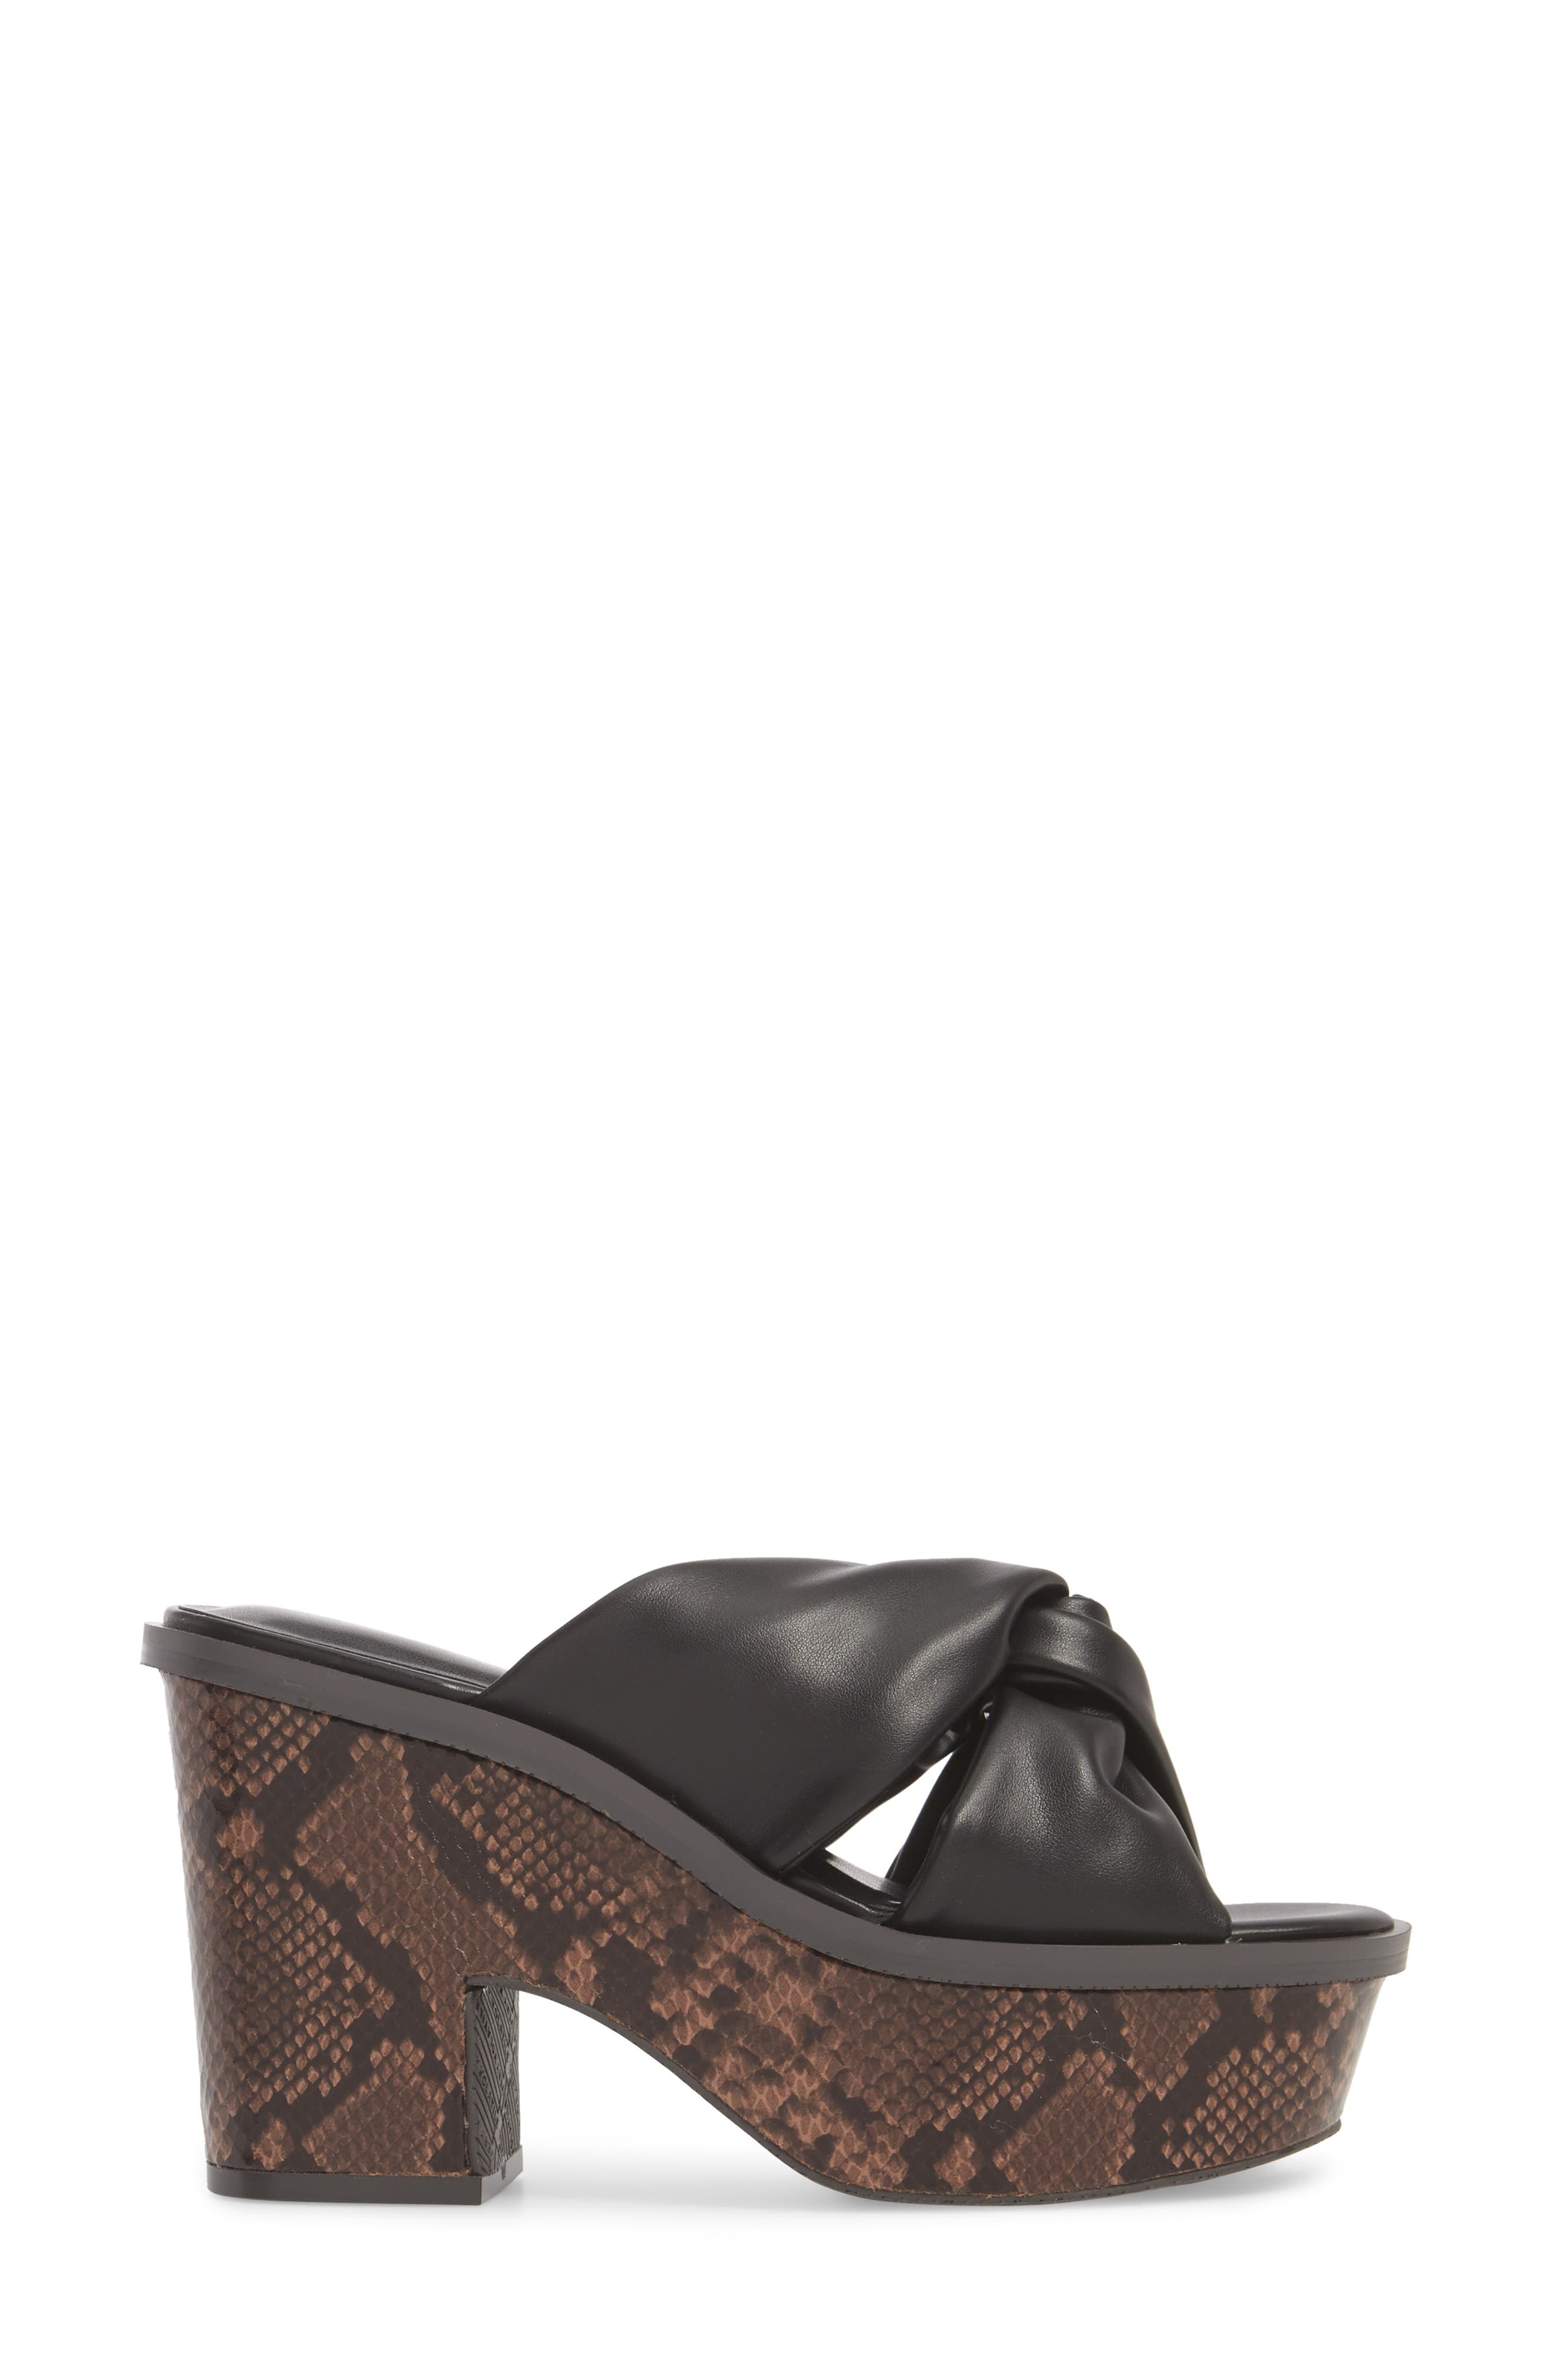 Ainsley Platform Sandal,                             Alternate thumbnail 3, color,                             BLACK